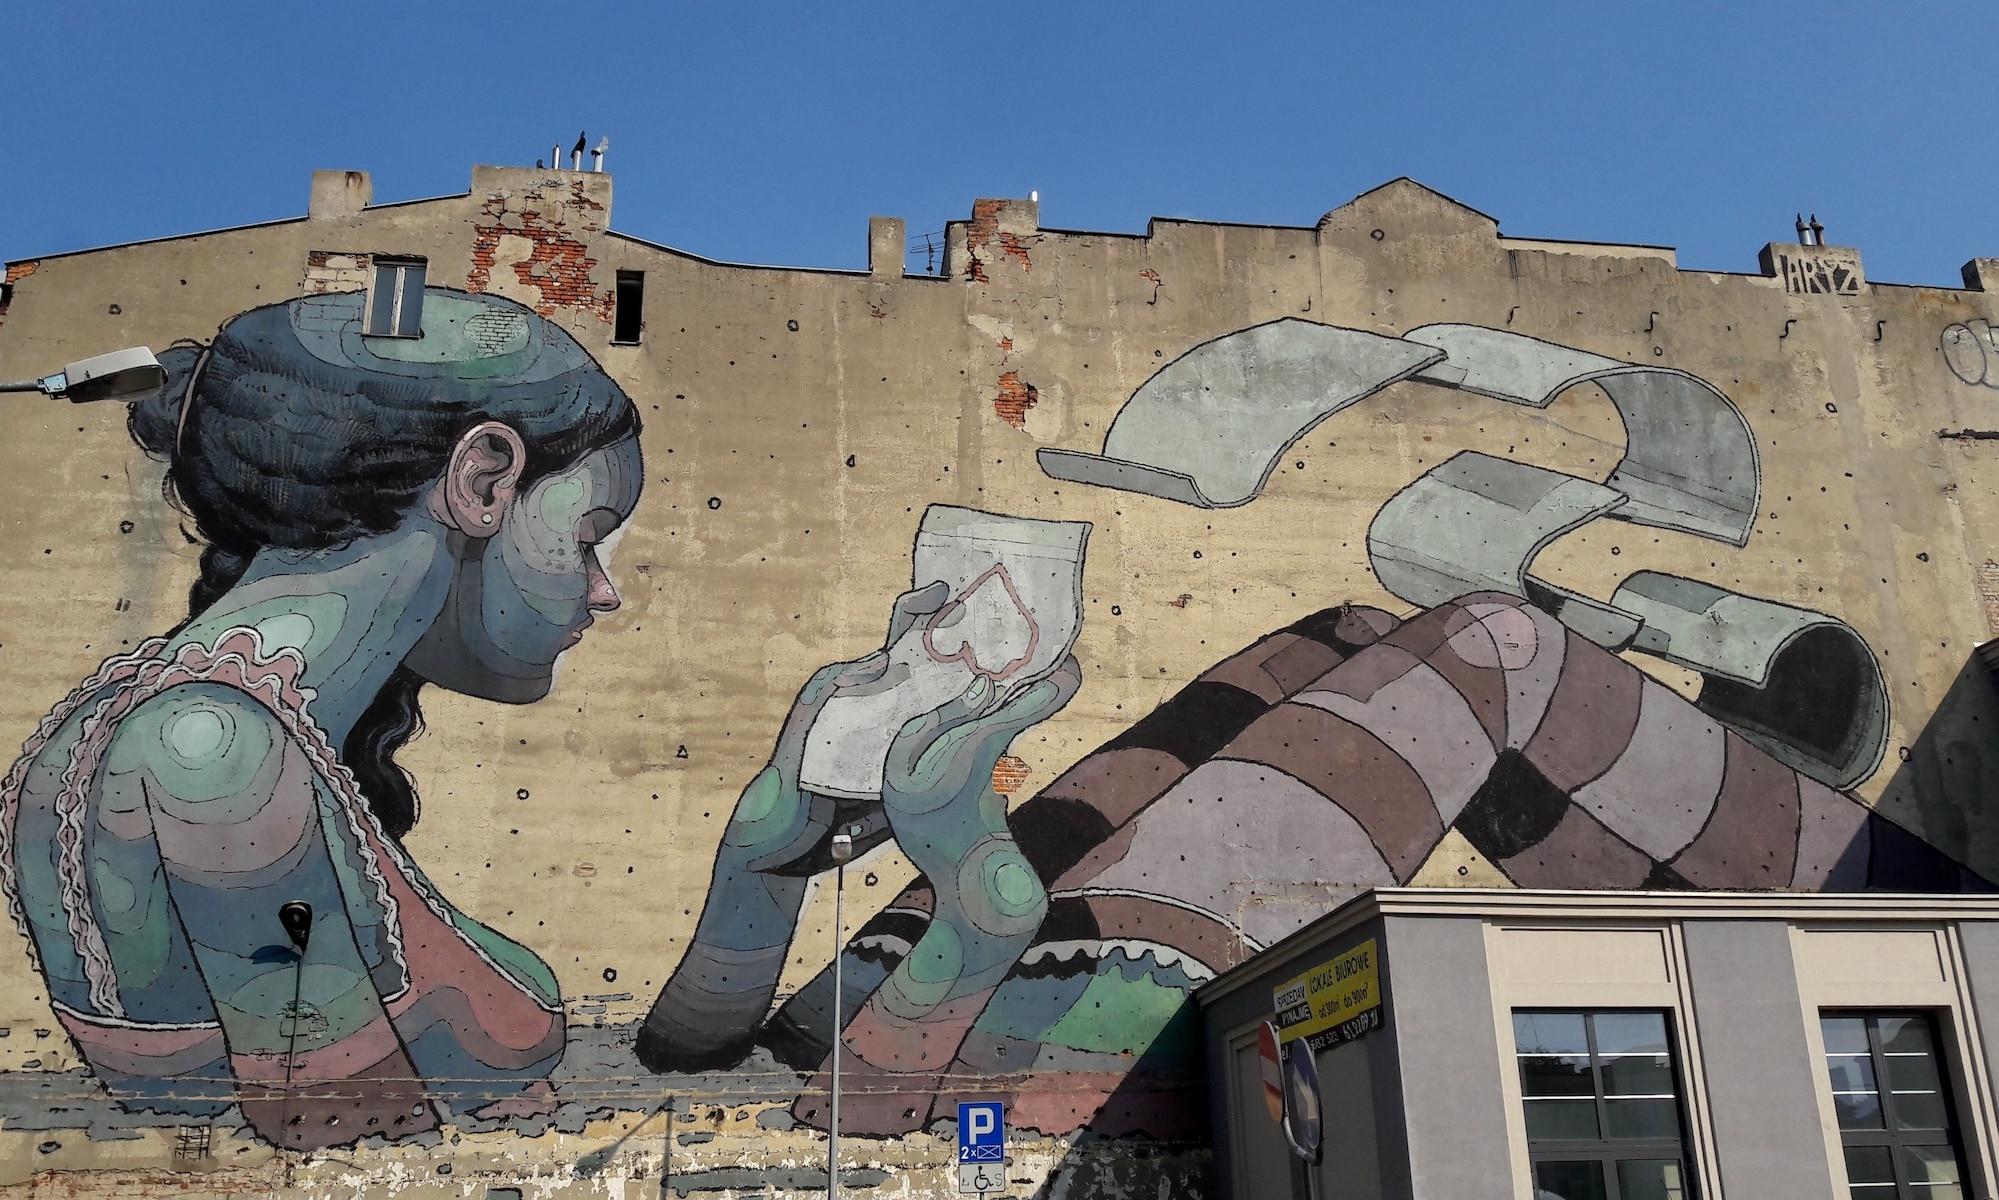 Street Artiste : Aryz